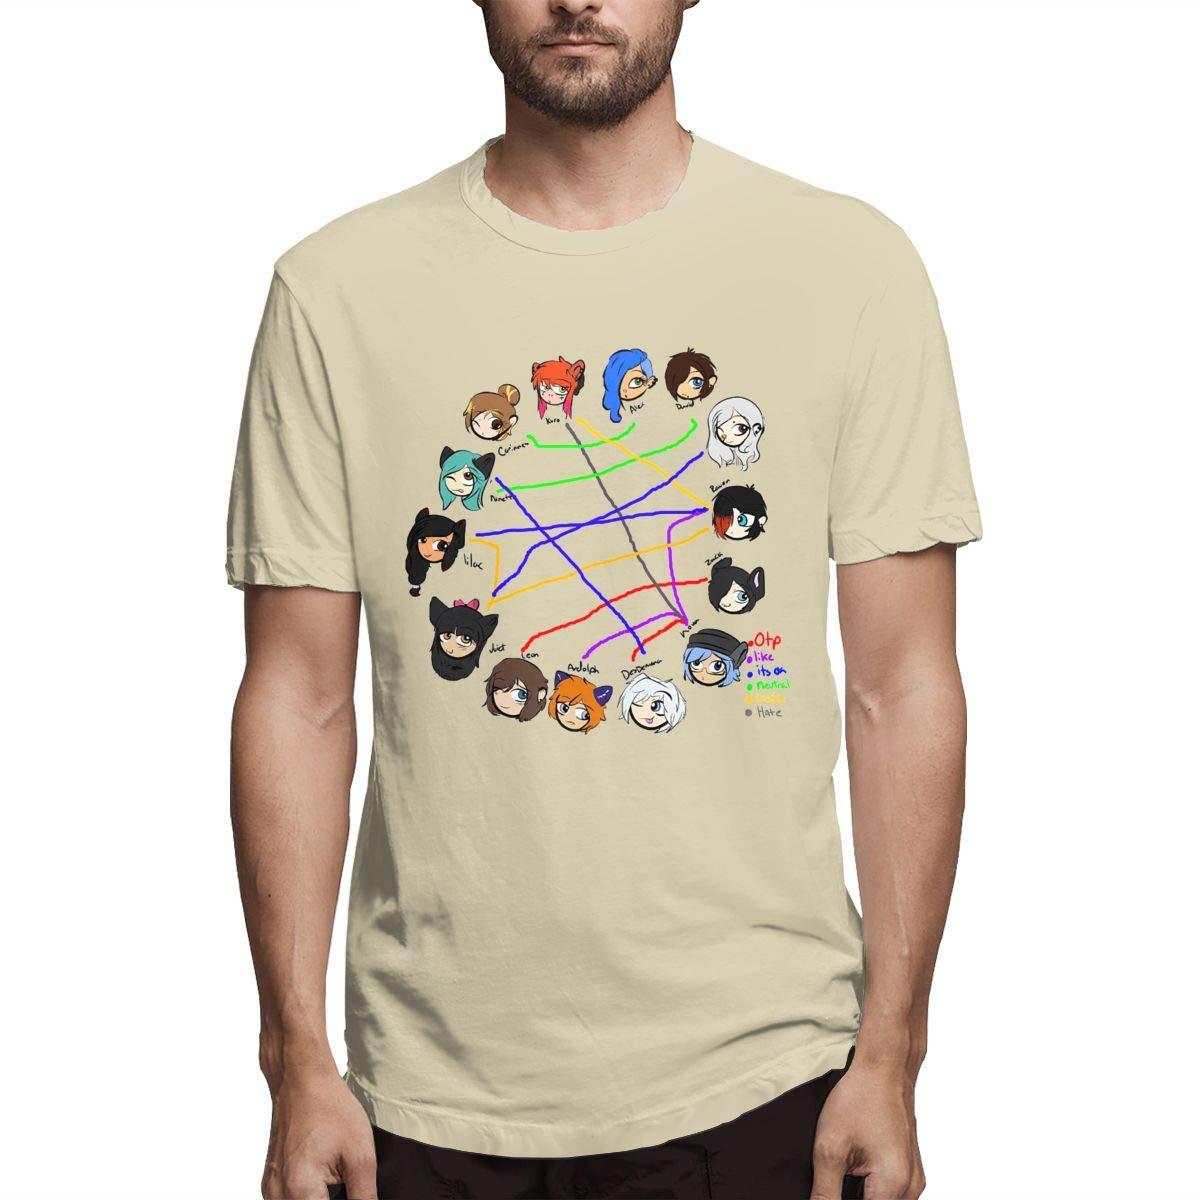 SHENGN Mens Personalized \r\nCasual MyStreet Kids Ship Chart Aphmau Short Sleeve Novelty T Shirt Gray